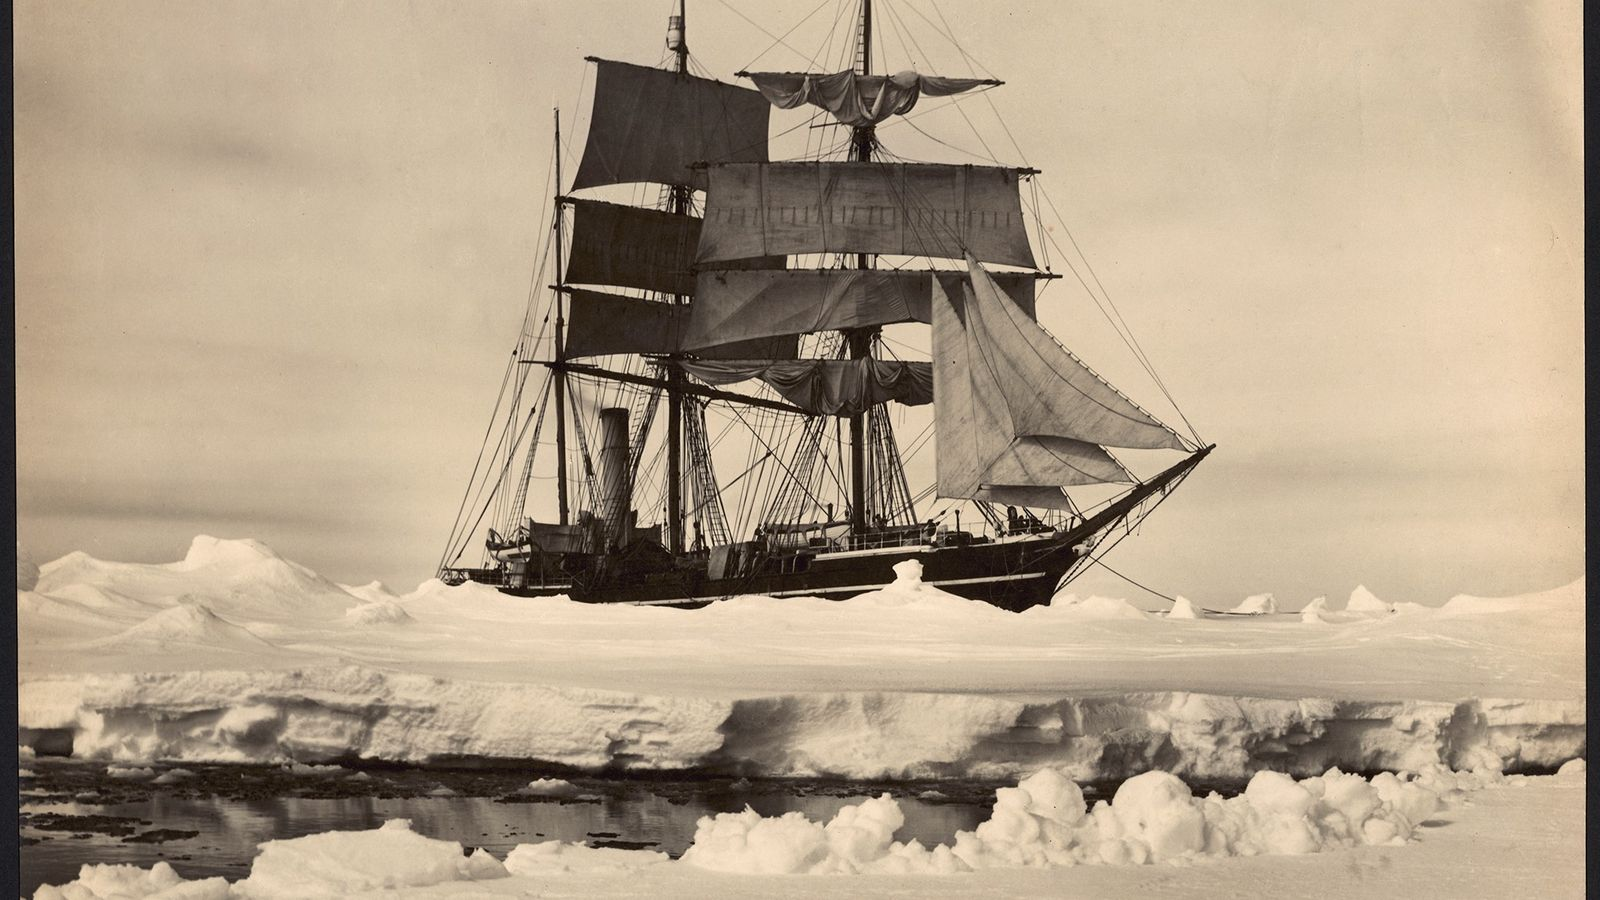 Polar explorer Robert Falcon Scott's ship Terra Nova is moored amid pack ice in Antarctica in ...